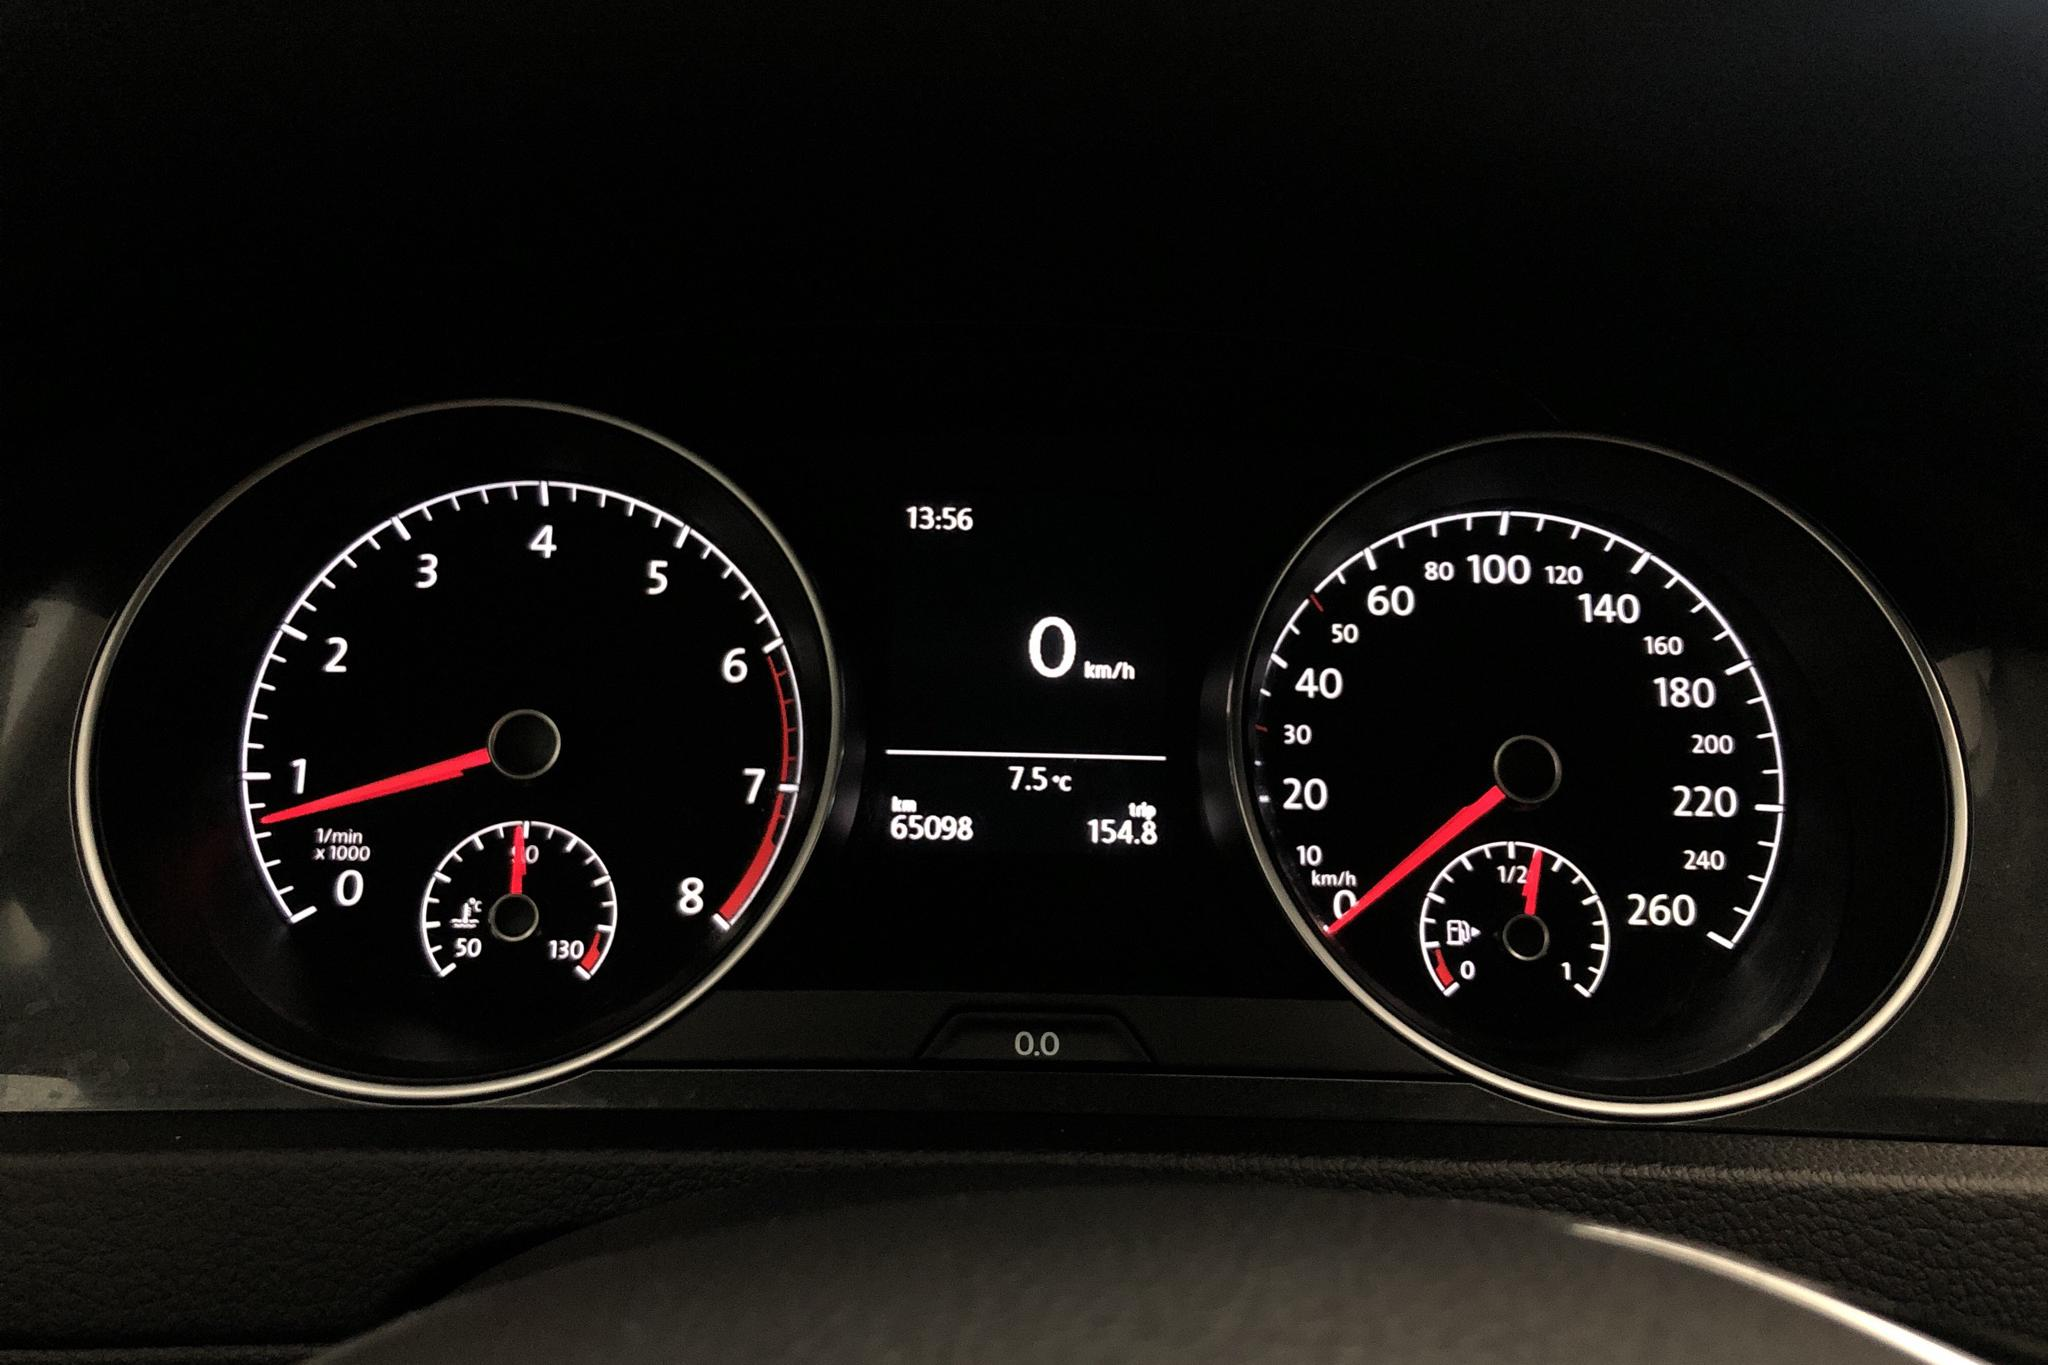 VW Golf VII 1.4 TSI Multifuel 5dr (125hk) - 65 080 km - Manual - Dark Grey - 2018